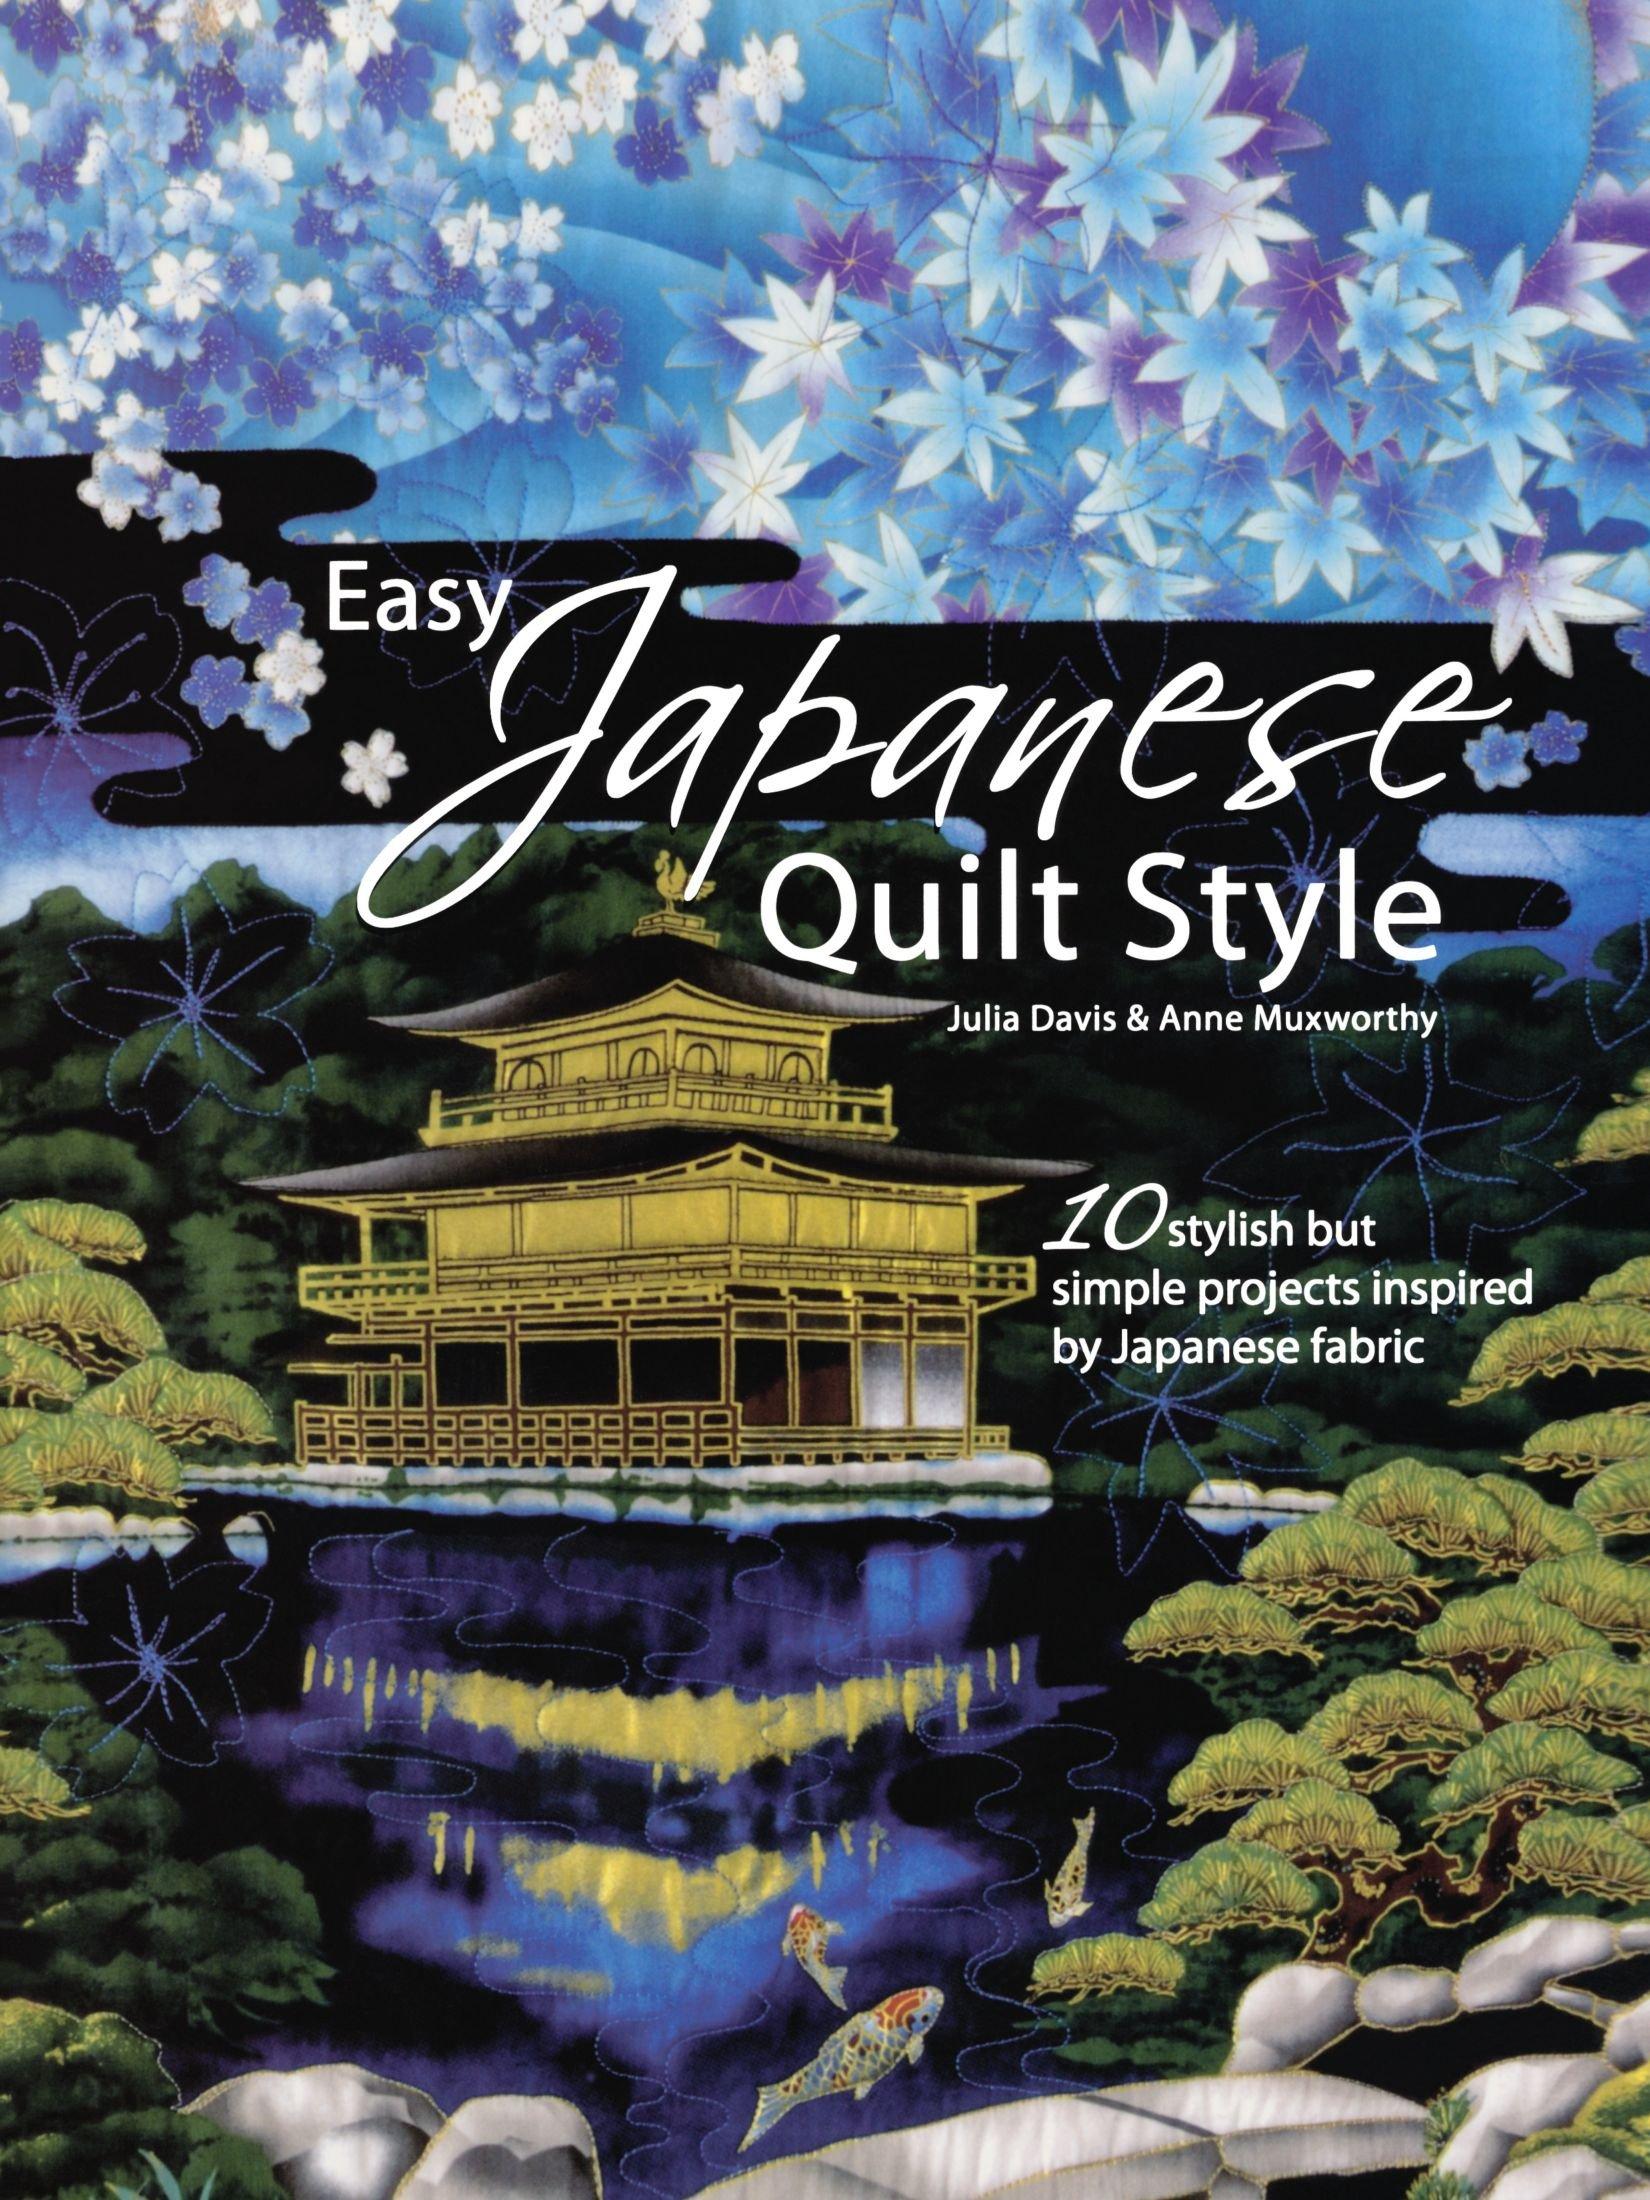 Easy Japanese Quilt Style: Julia Davis, Anne Muxworthy ... : japanese style quilts - Adamdwight.com